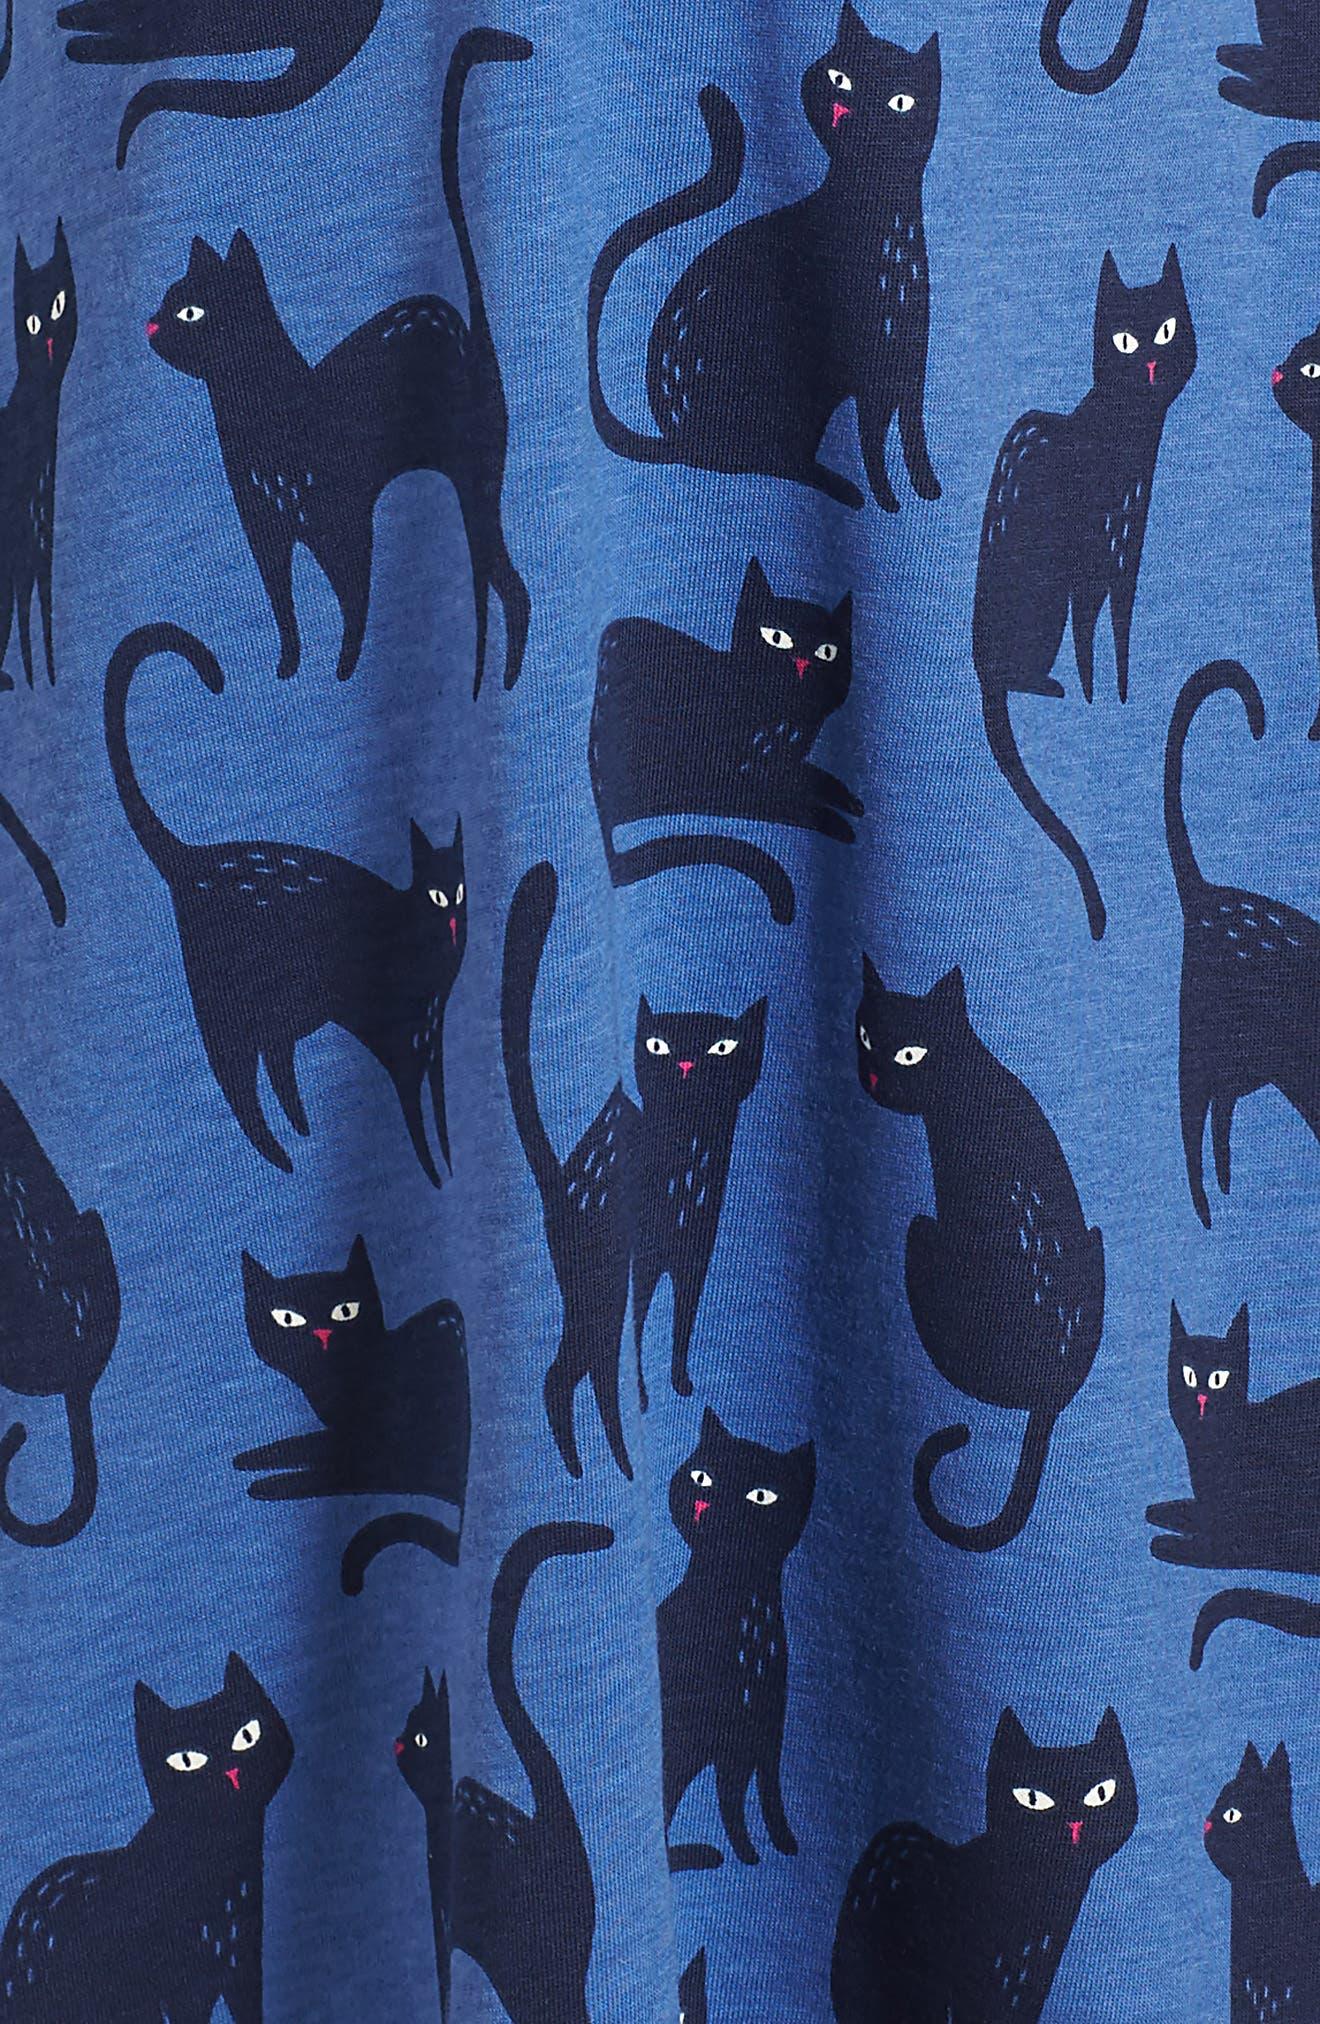 Cat Glow in the Dark Dress,                             Alternate thumbnail 4, color,                             404